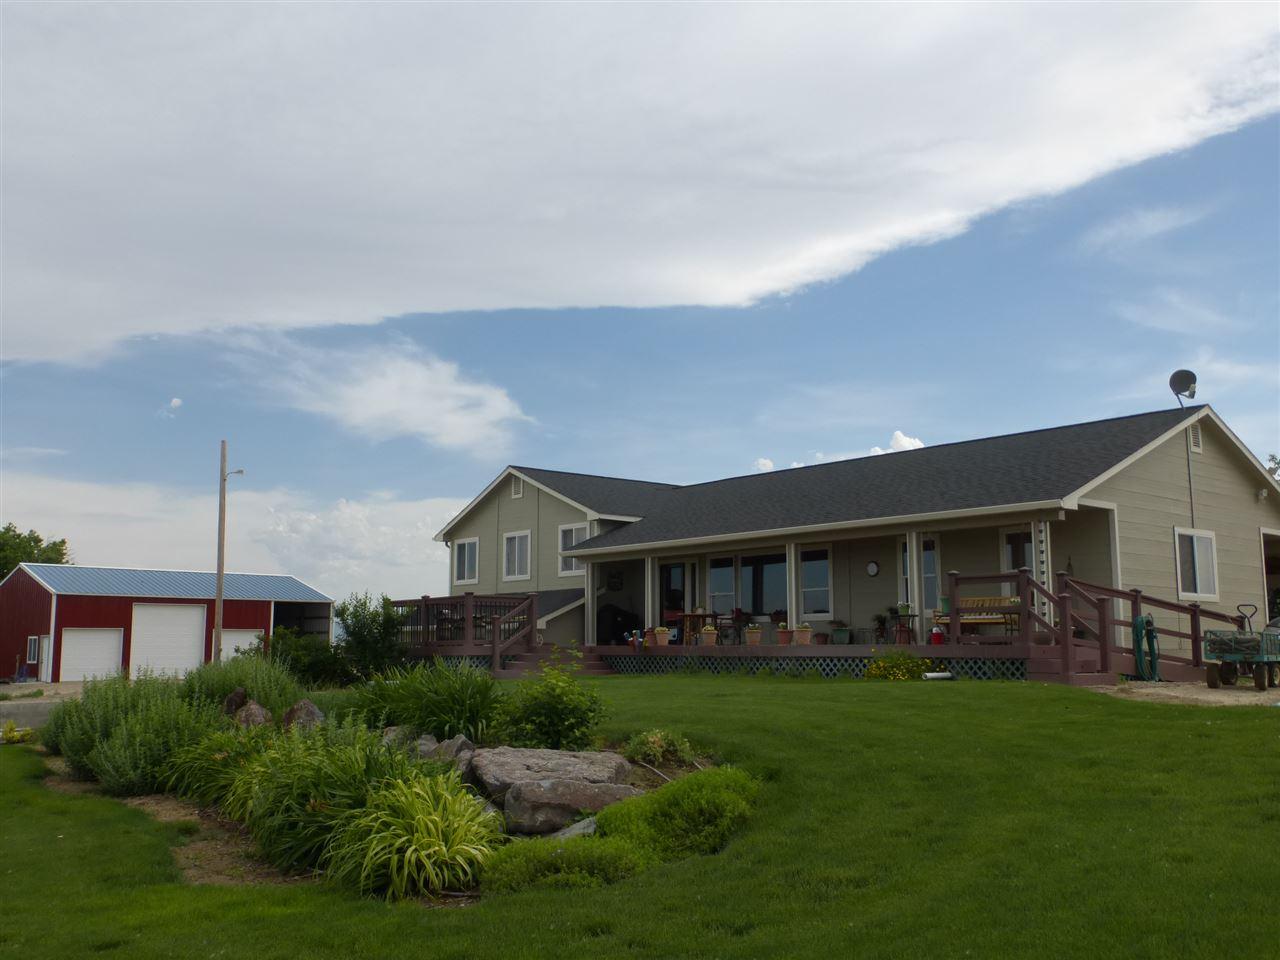 Single Family Home for Sale at 1552 Sanctuary Lane 1552 Sanctuary Lane Homedale, Idaho 83628